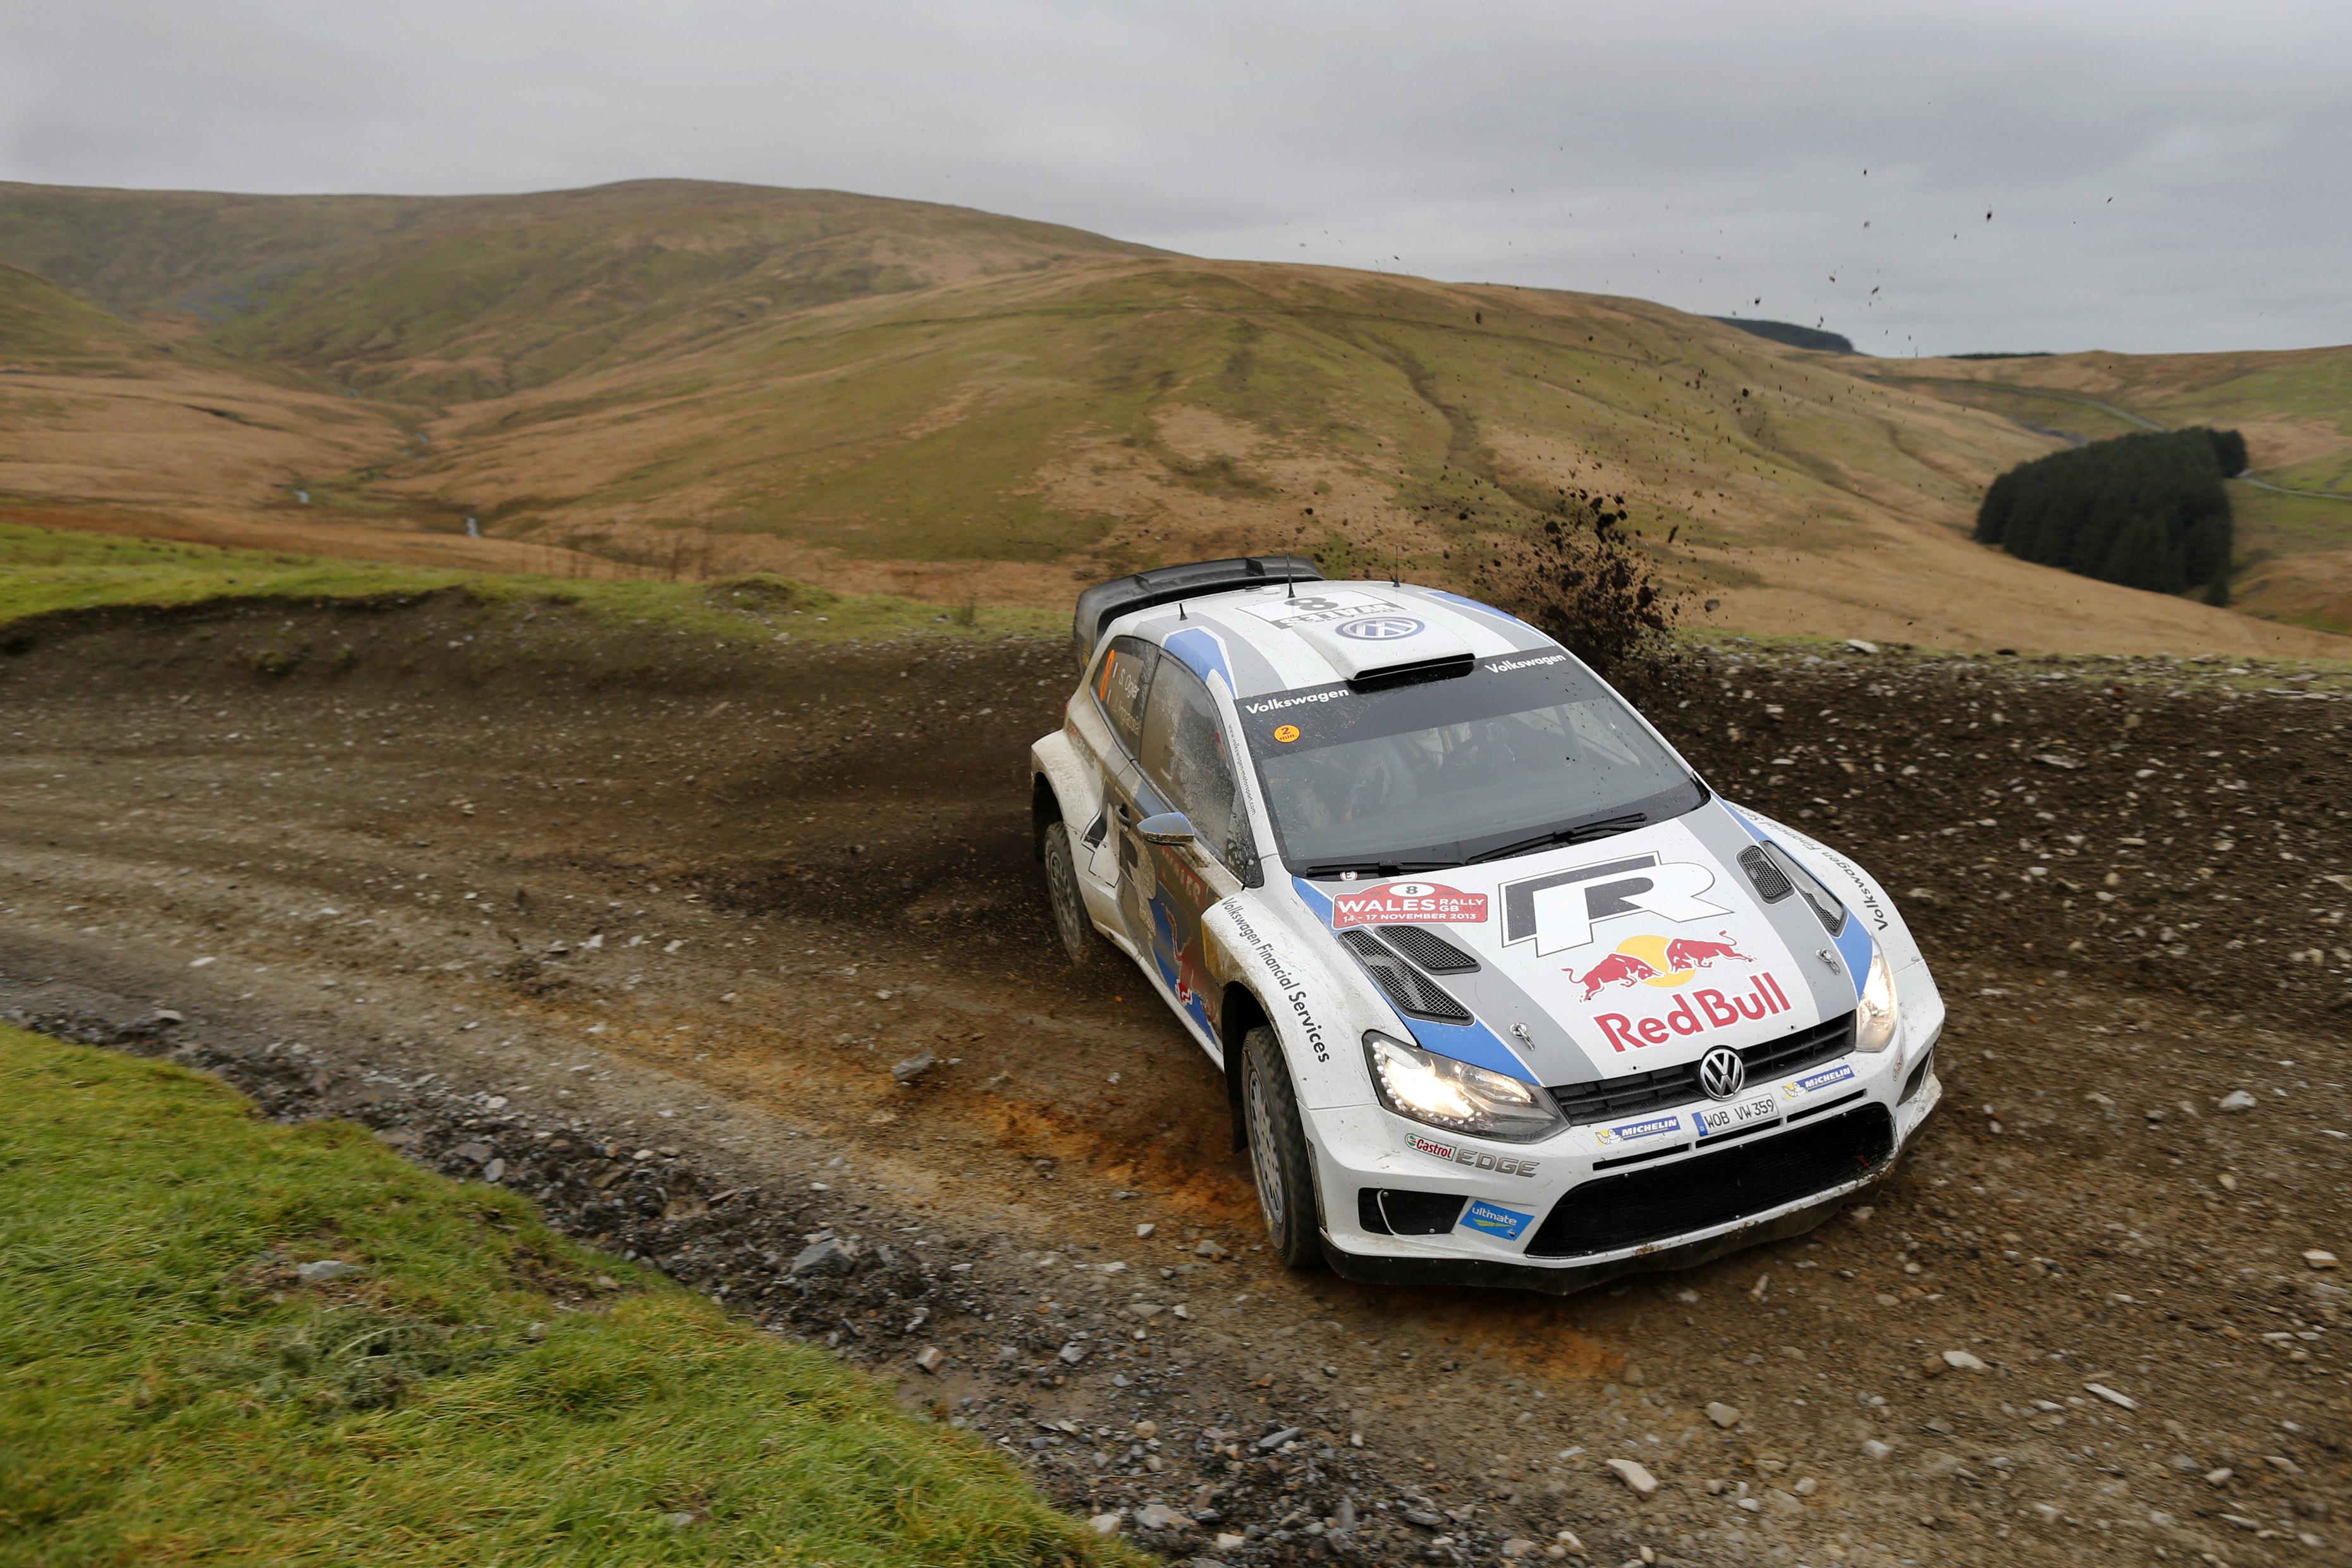 WRC 2013 - Wales Rally GB